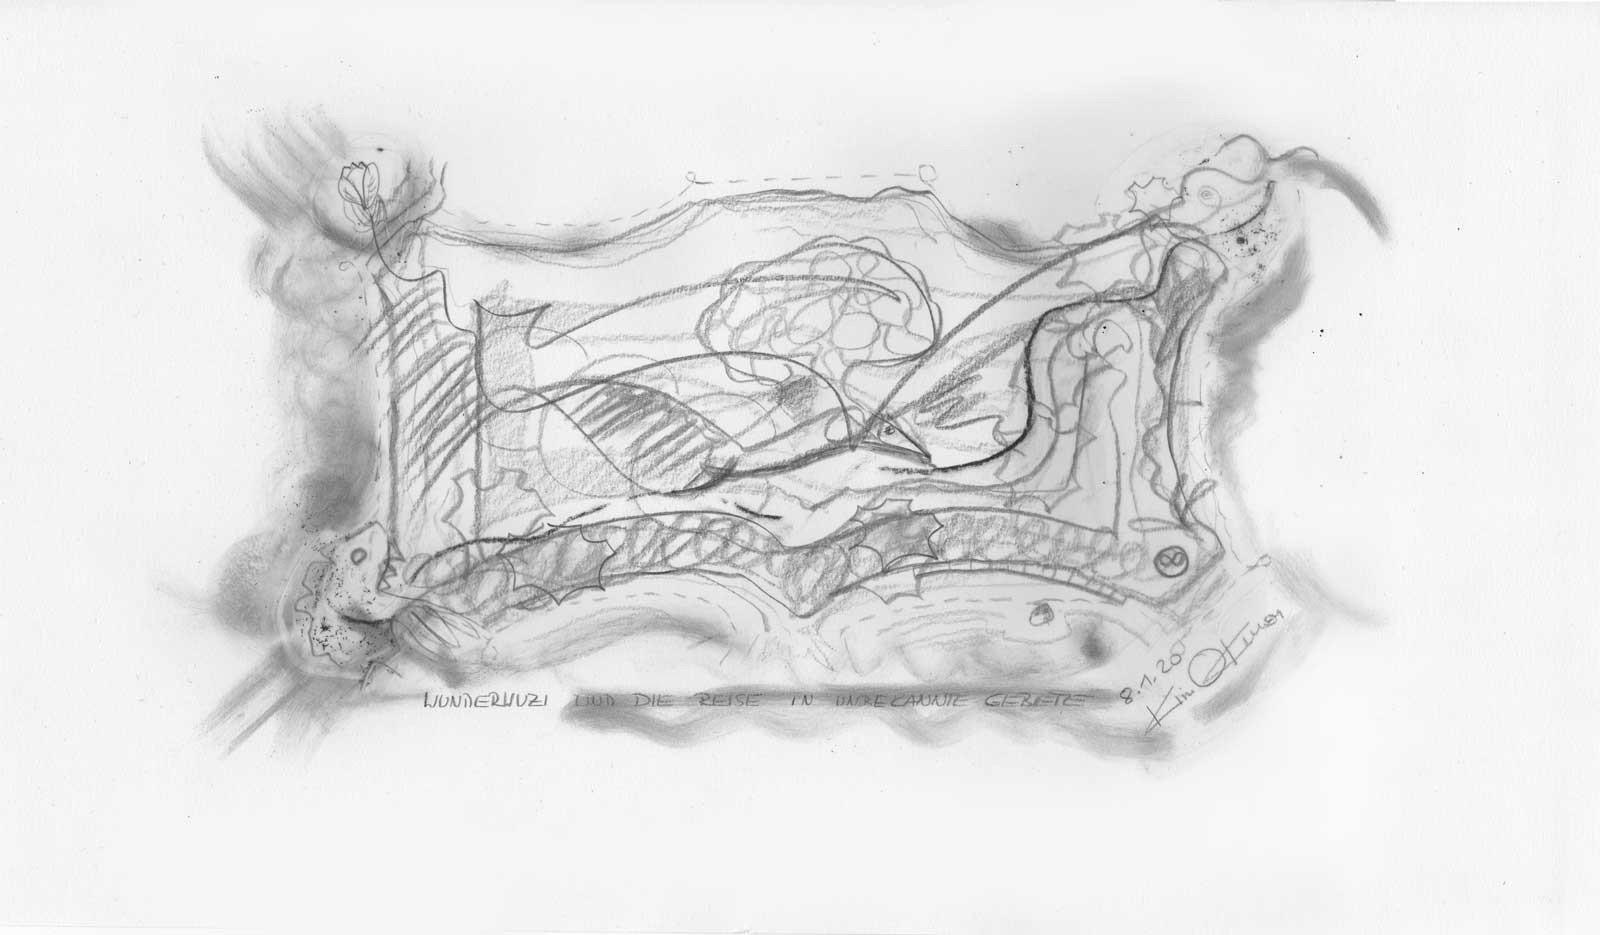 Kim Okura drawing Okurism Joytrophy Wunderwuzi